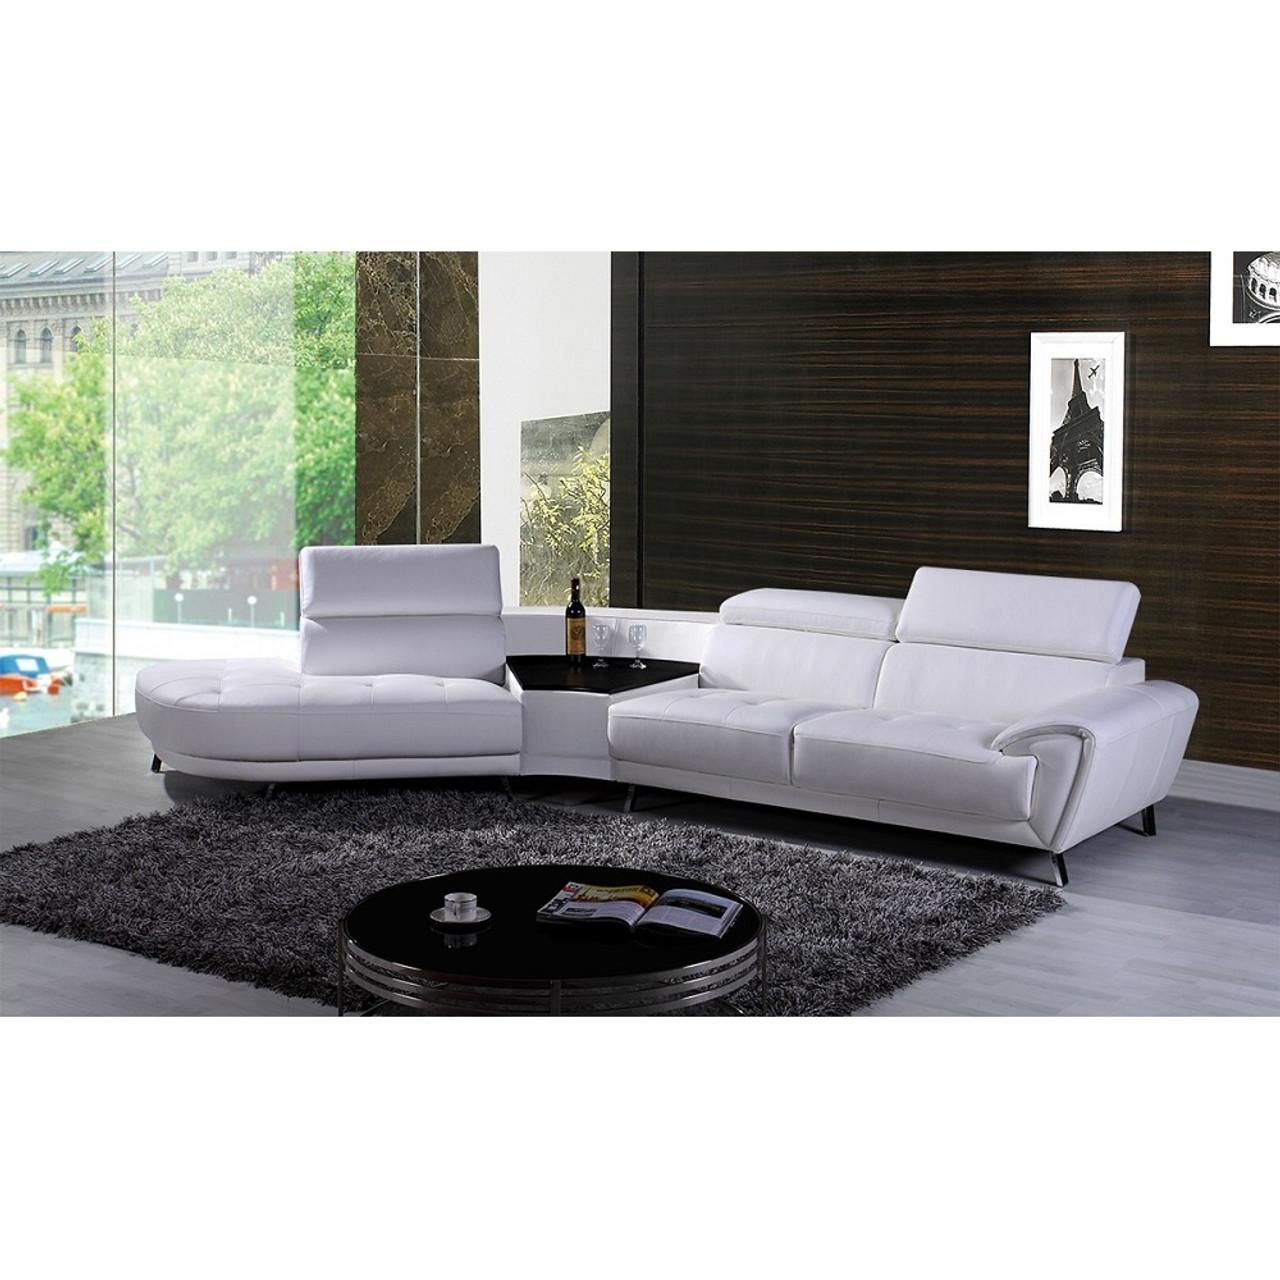 Divani Casa Raizel Modern White Leather Sectional Sofa W Left